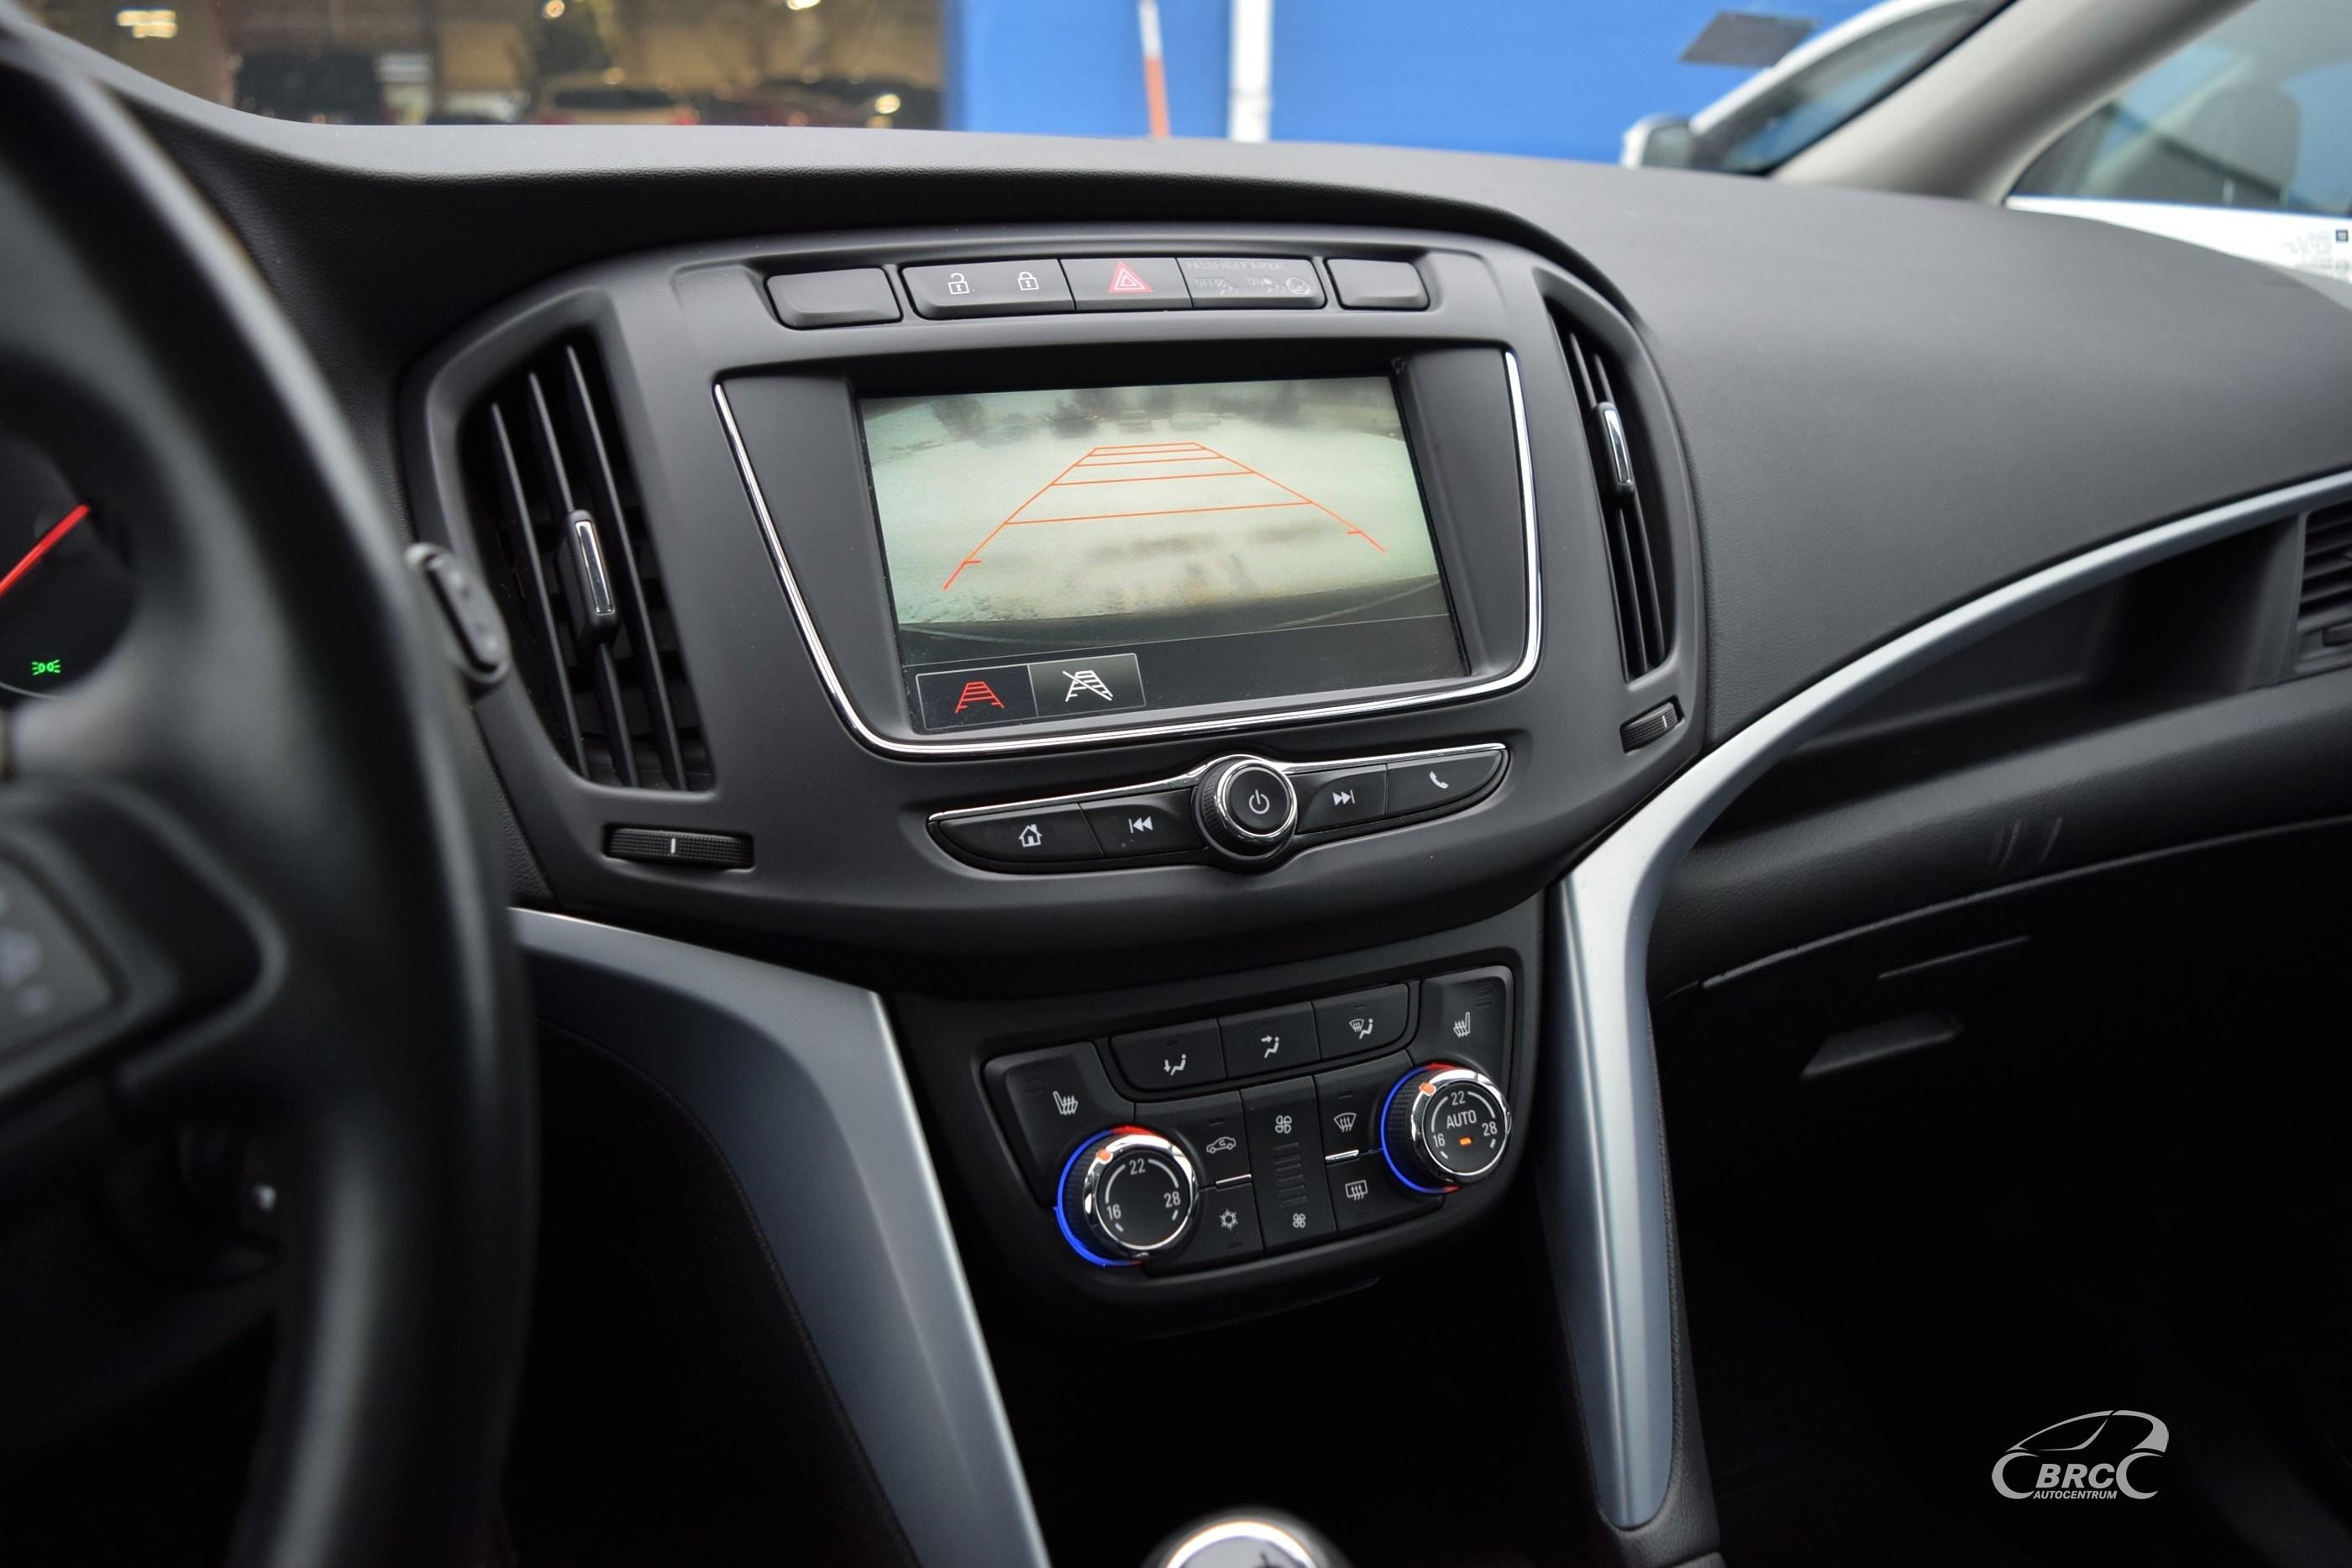 Opel Zafira Tourer EcoFlex 7 seats